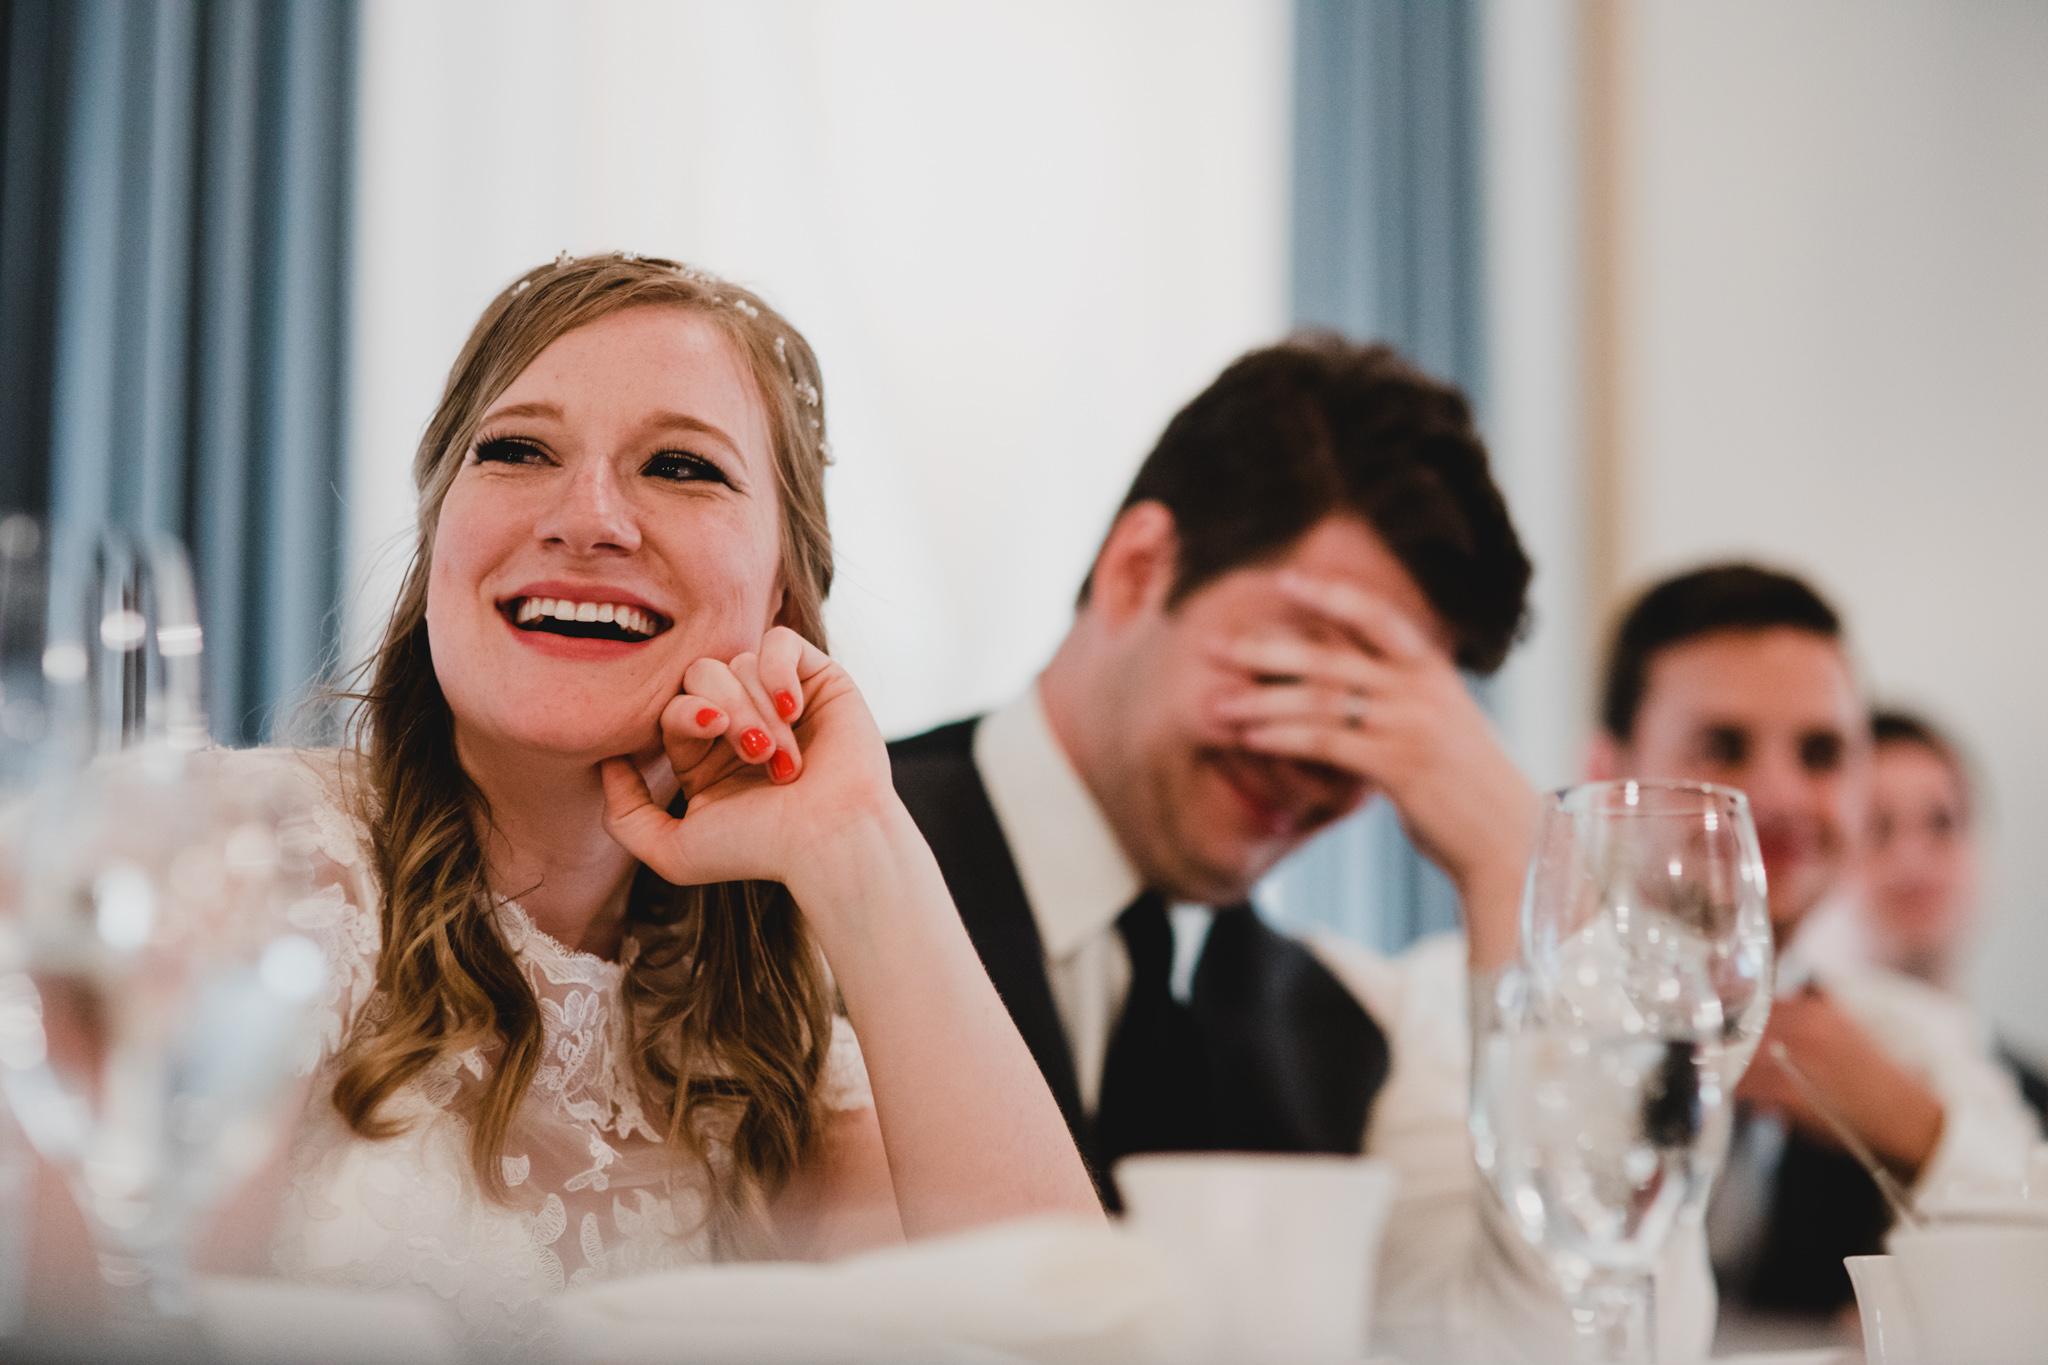 Natural wedding photography, candid